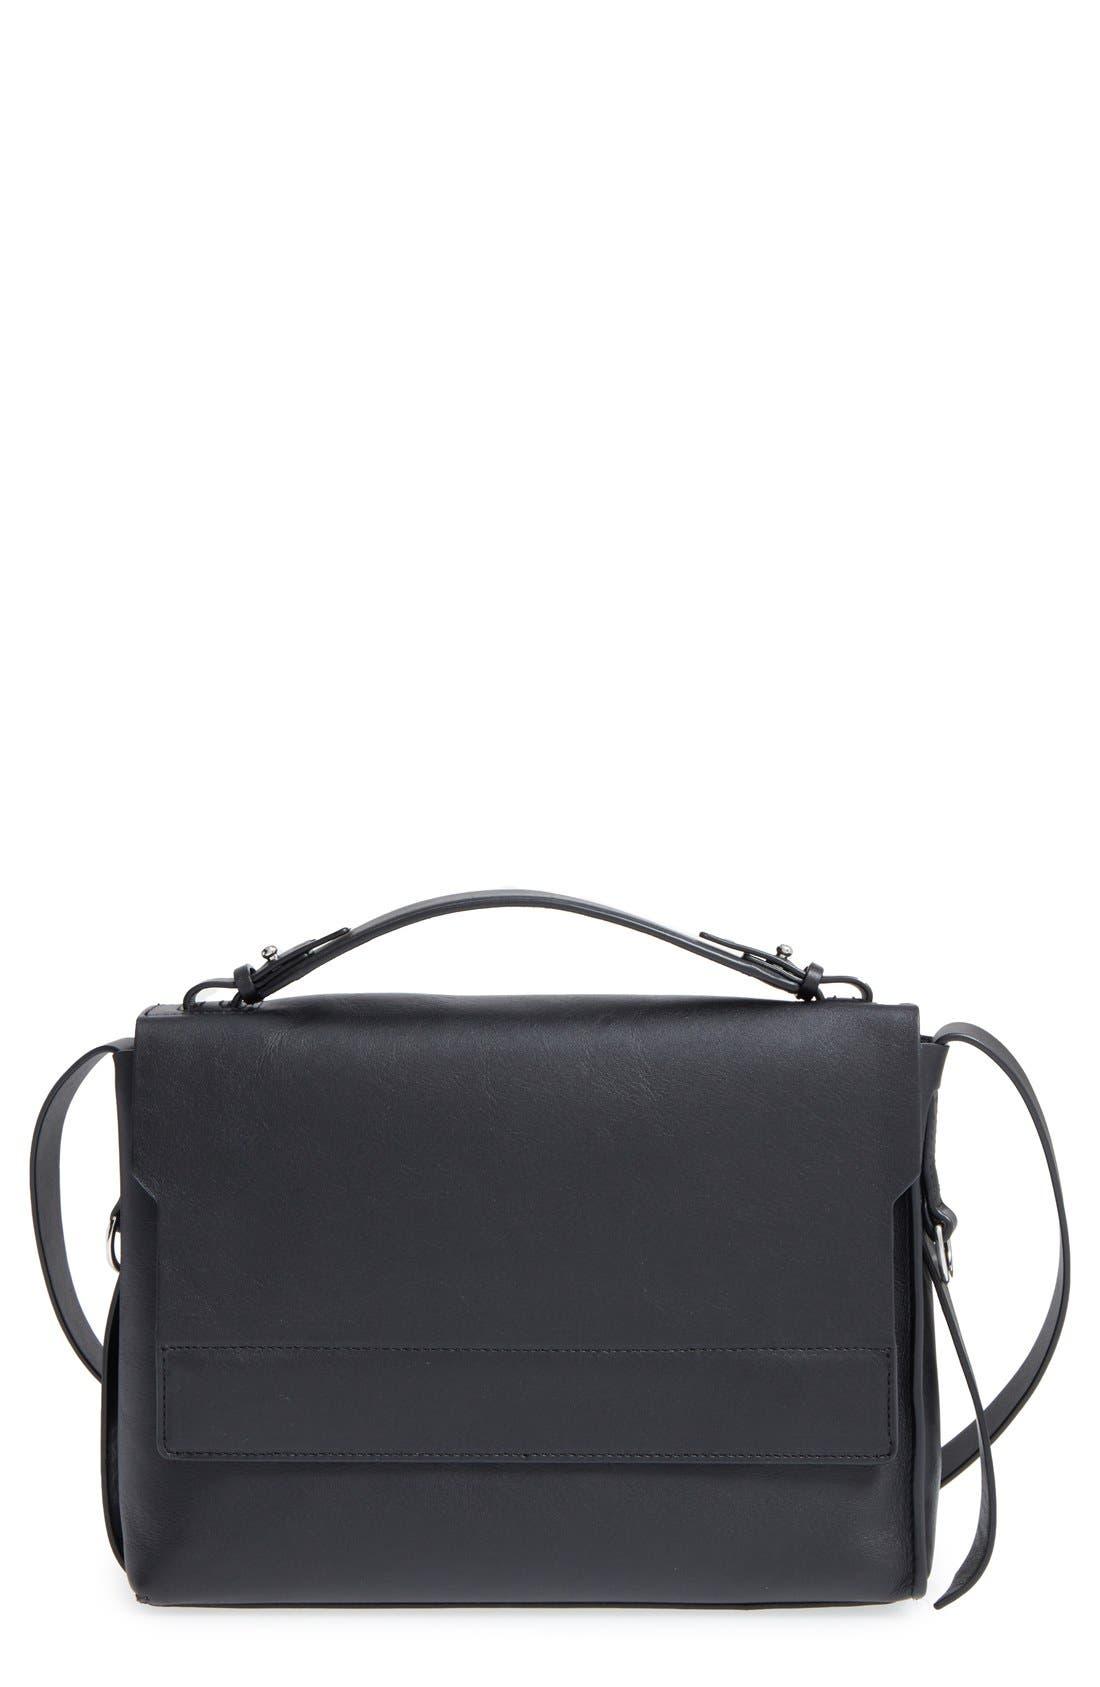 ALLSAINTS 'Paradise' Leather Shoulder Bag